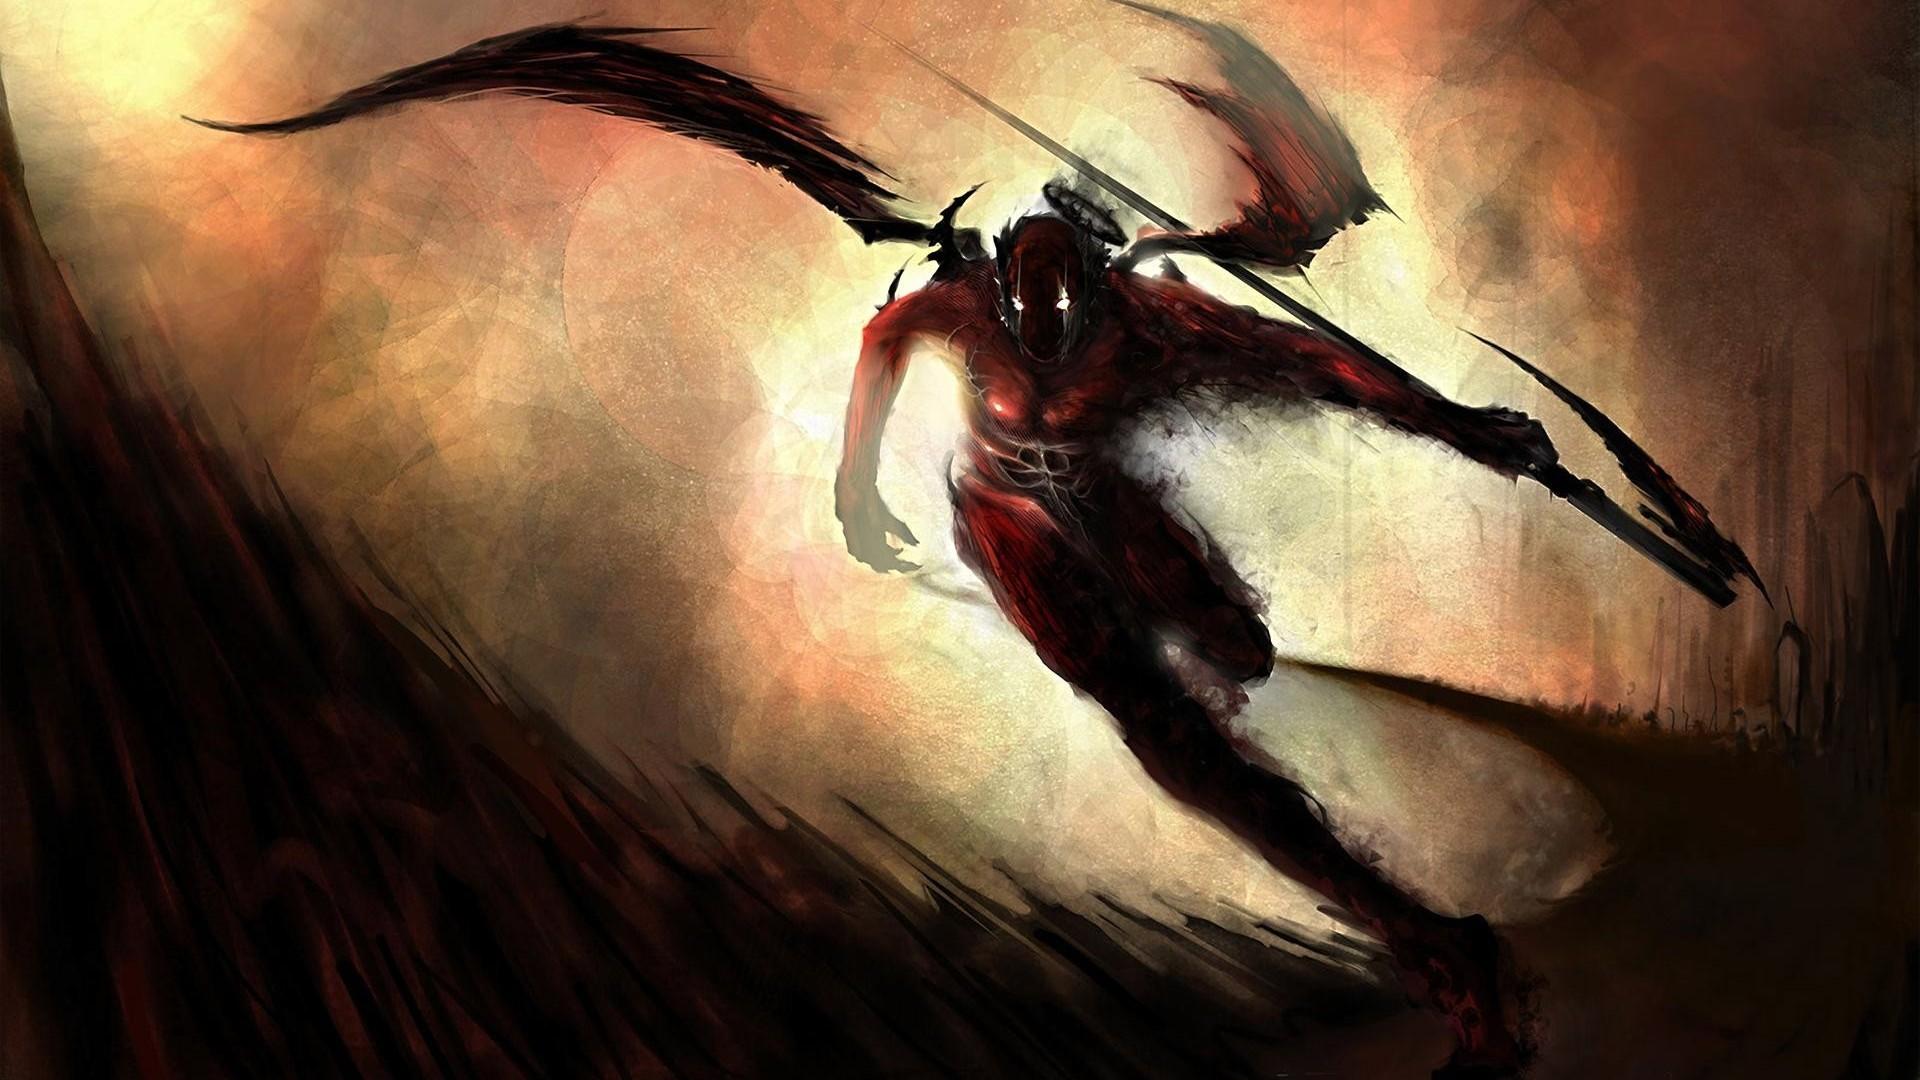 Devil wallpaper #5355